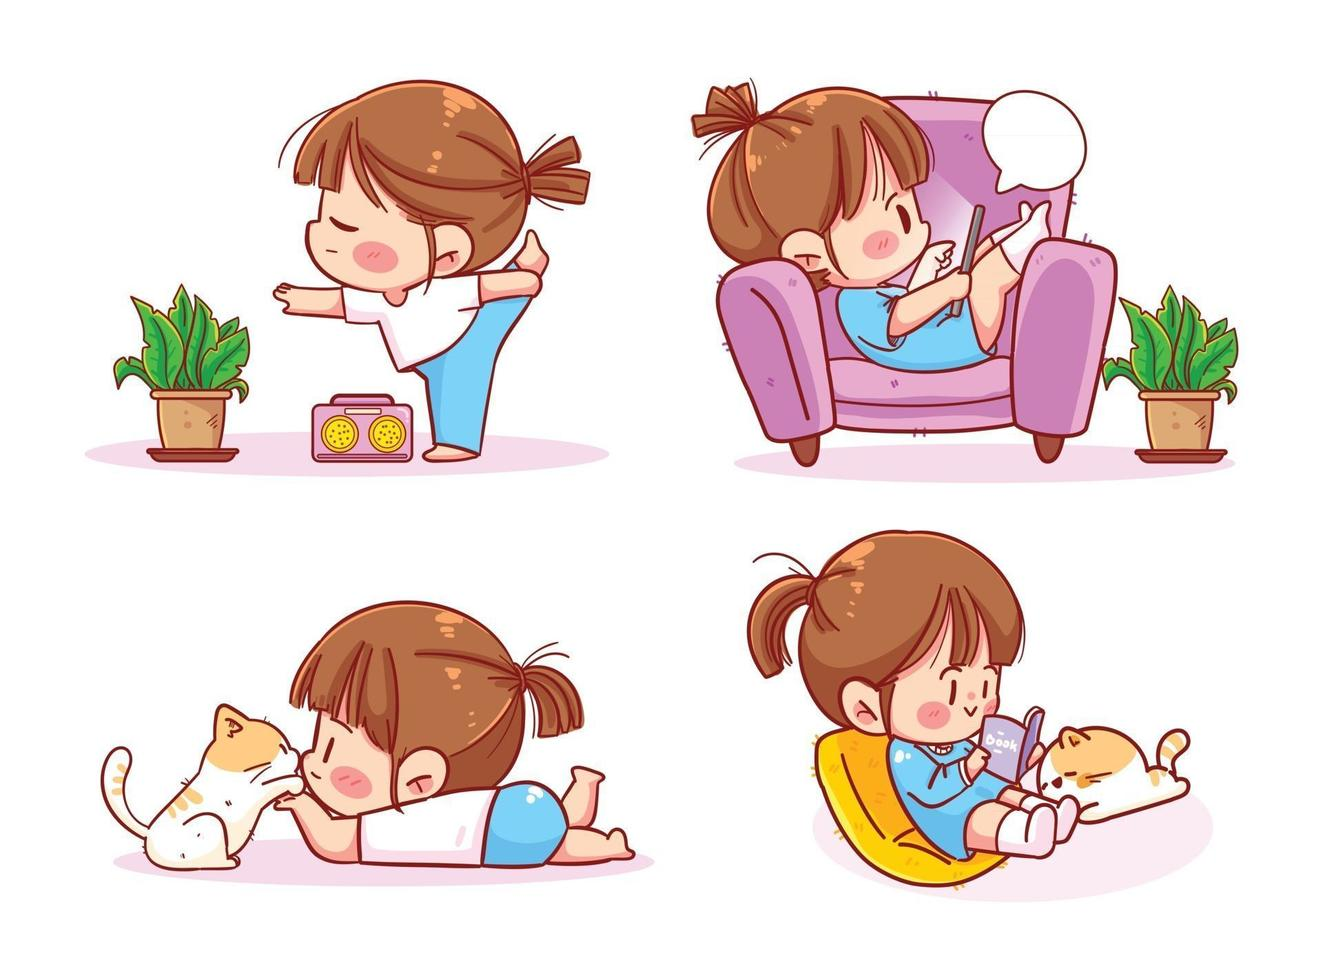 Cute Girl reading book, doing yoga, quarantine due to coronavirus home activities vector